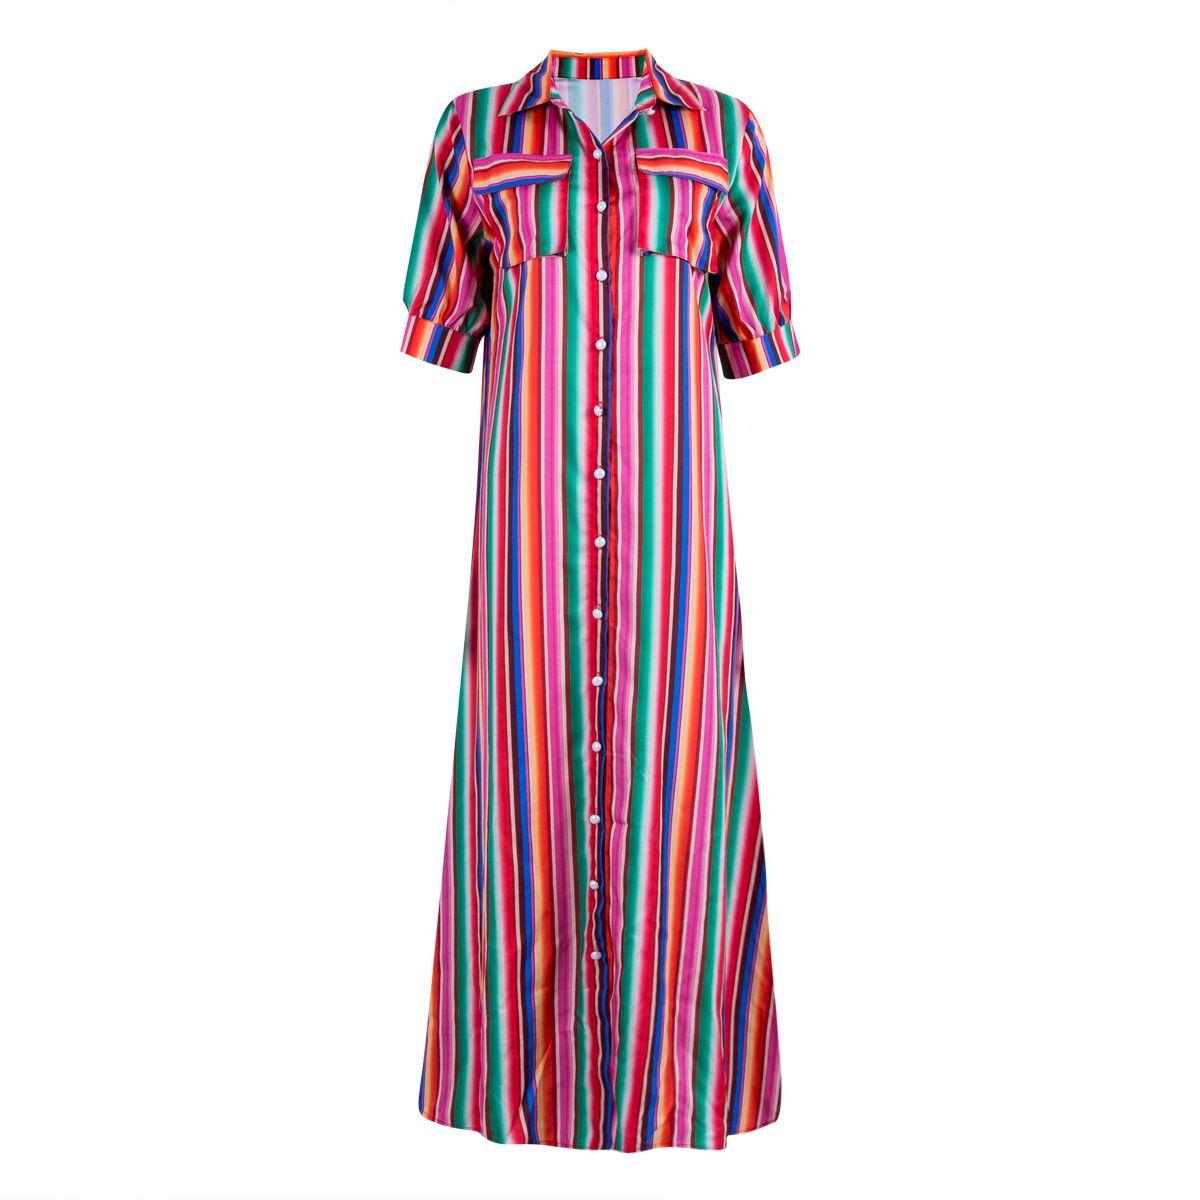 e42f00e7b187 Elegant Woman Boho Long Maxi Dress Fashion Lady Evening Party Summer Beach  Dresses Sundress Striped Shirt Dress Purple Lace Maxi Dress Short And Long  Dress ...